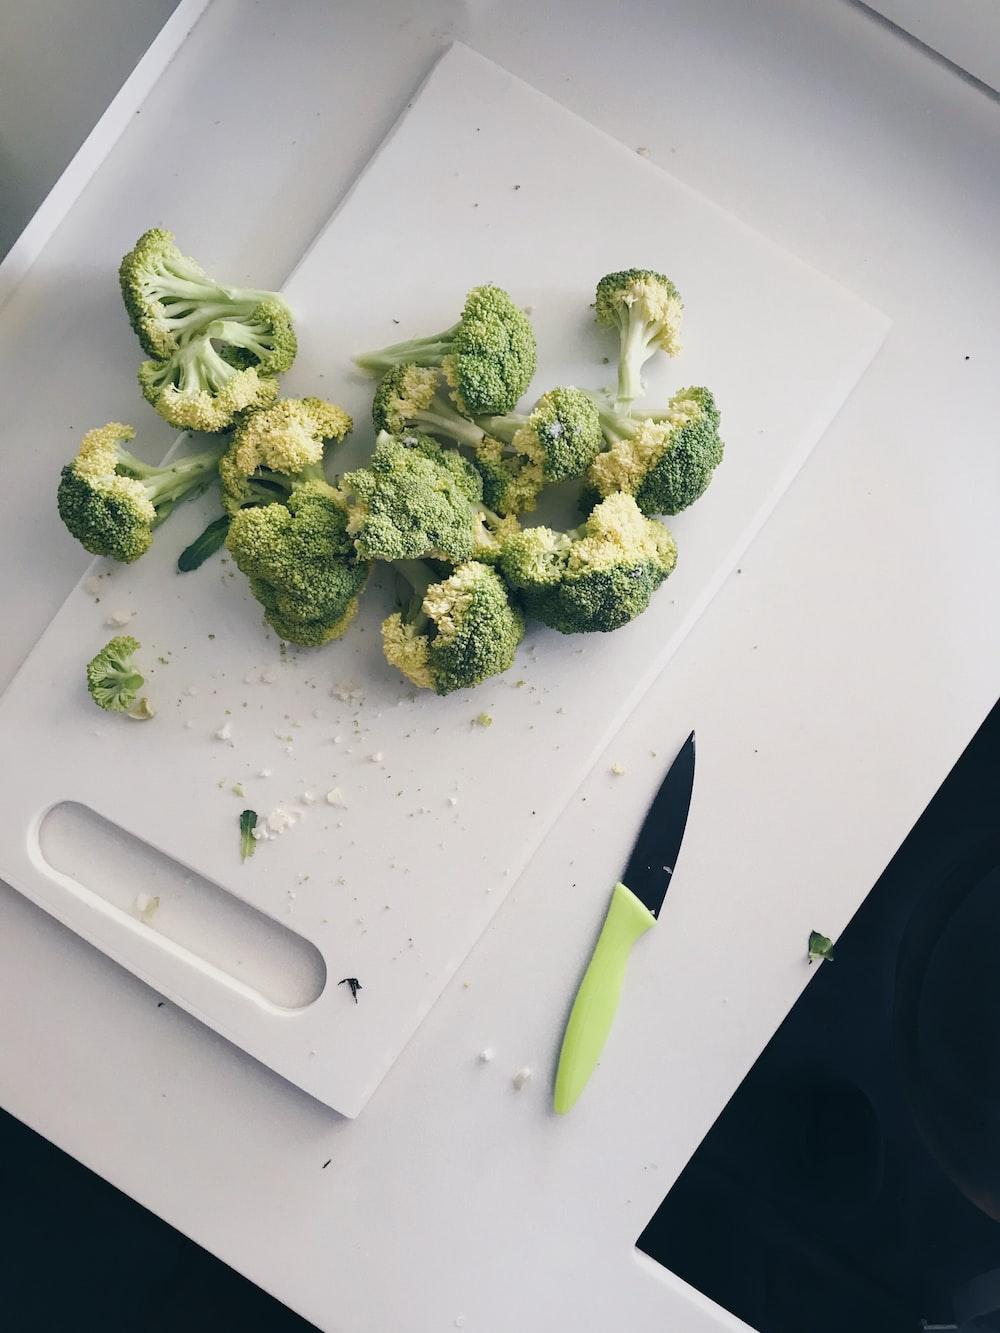 cauliflower on plate